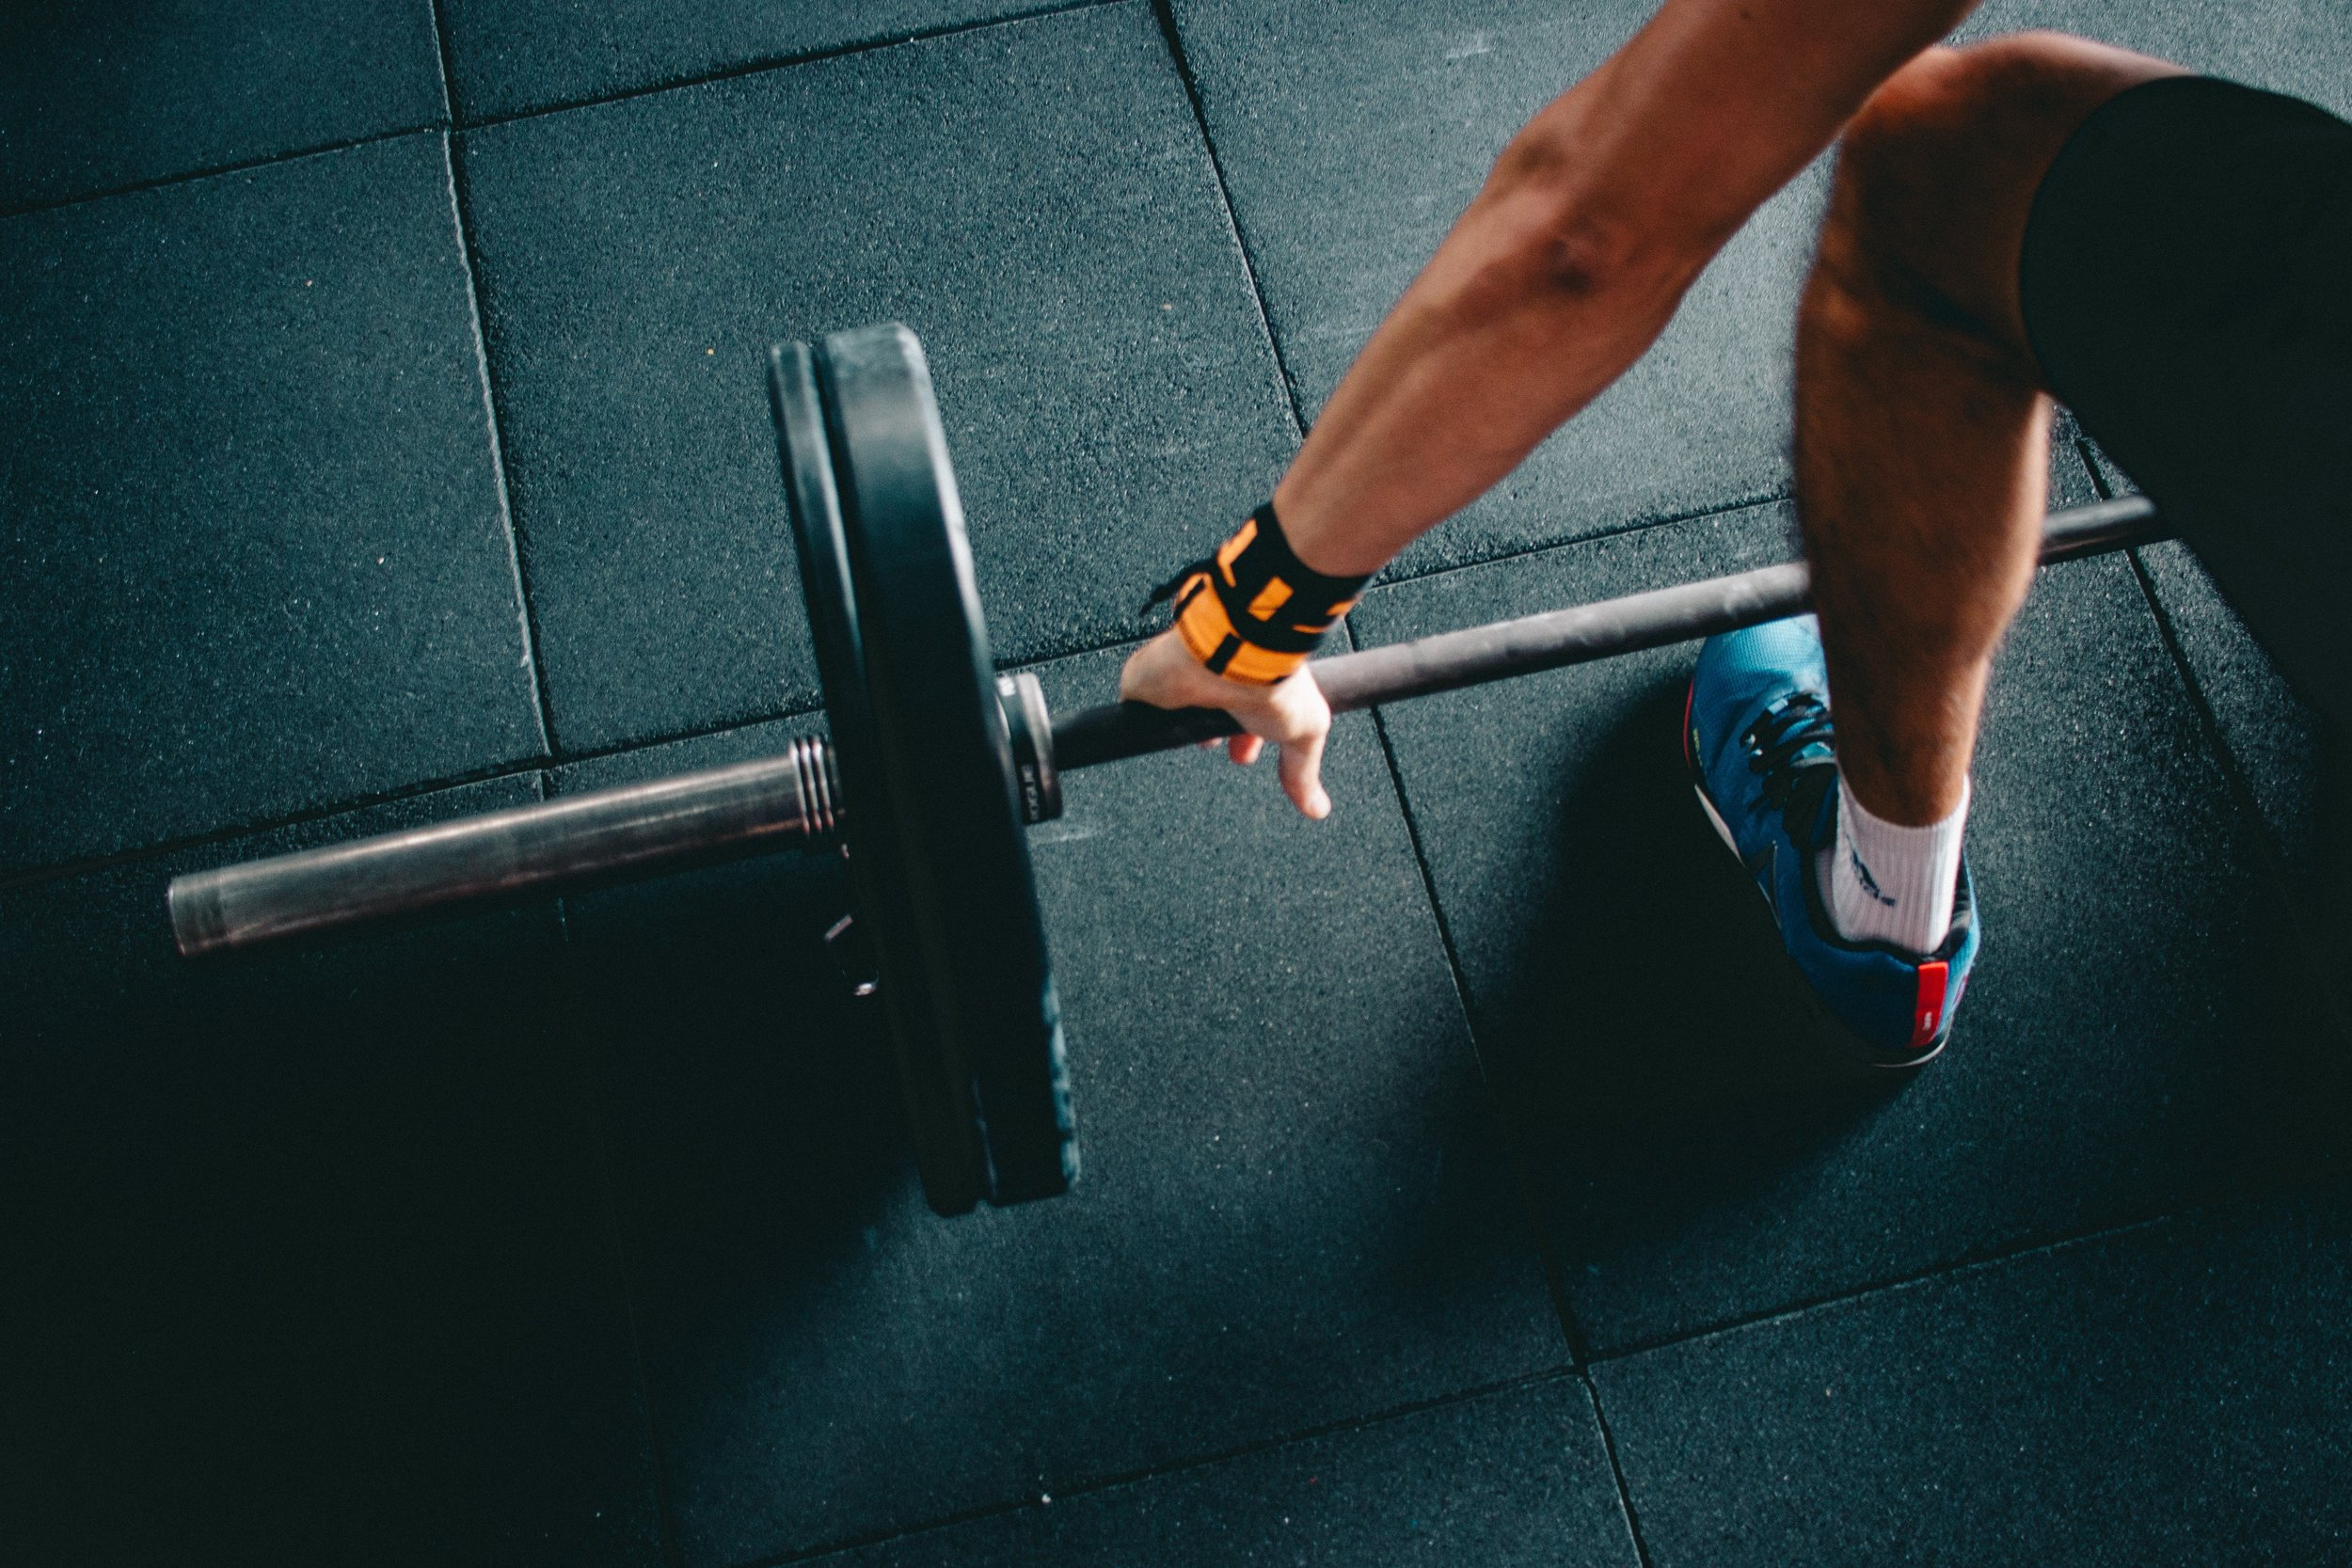 lifting weights.jpg